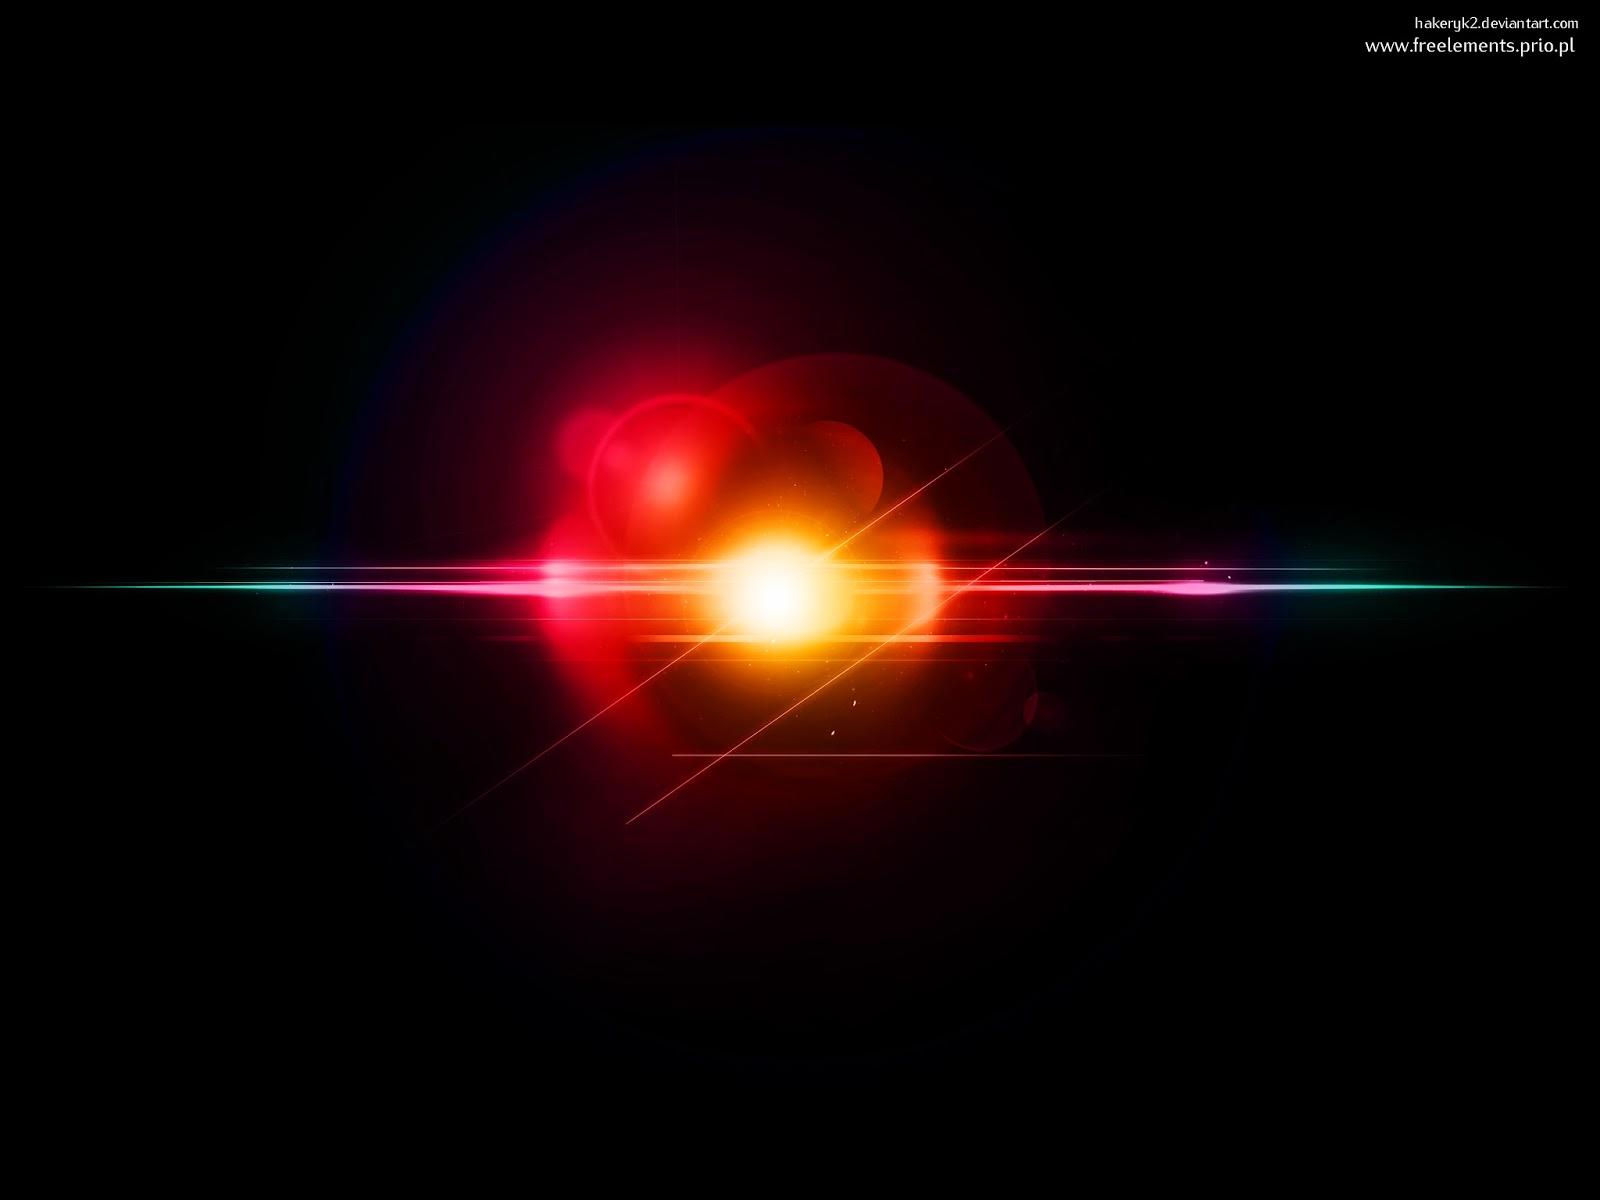 OPTICAL FLARES PARA ADOBE PHOTOSHOP CC — WINDOWS 8 /8.1 ...